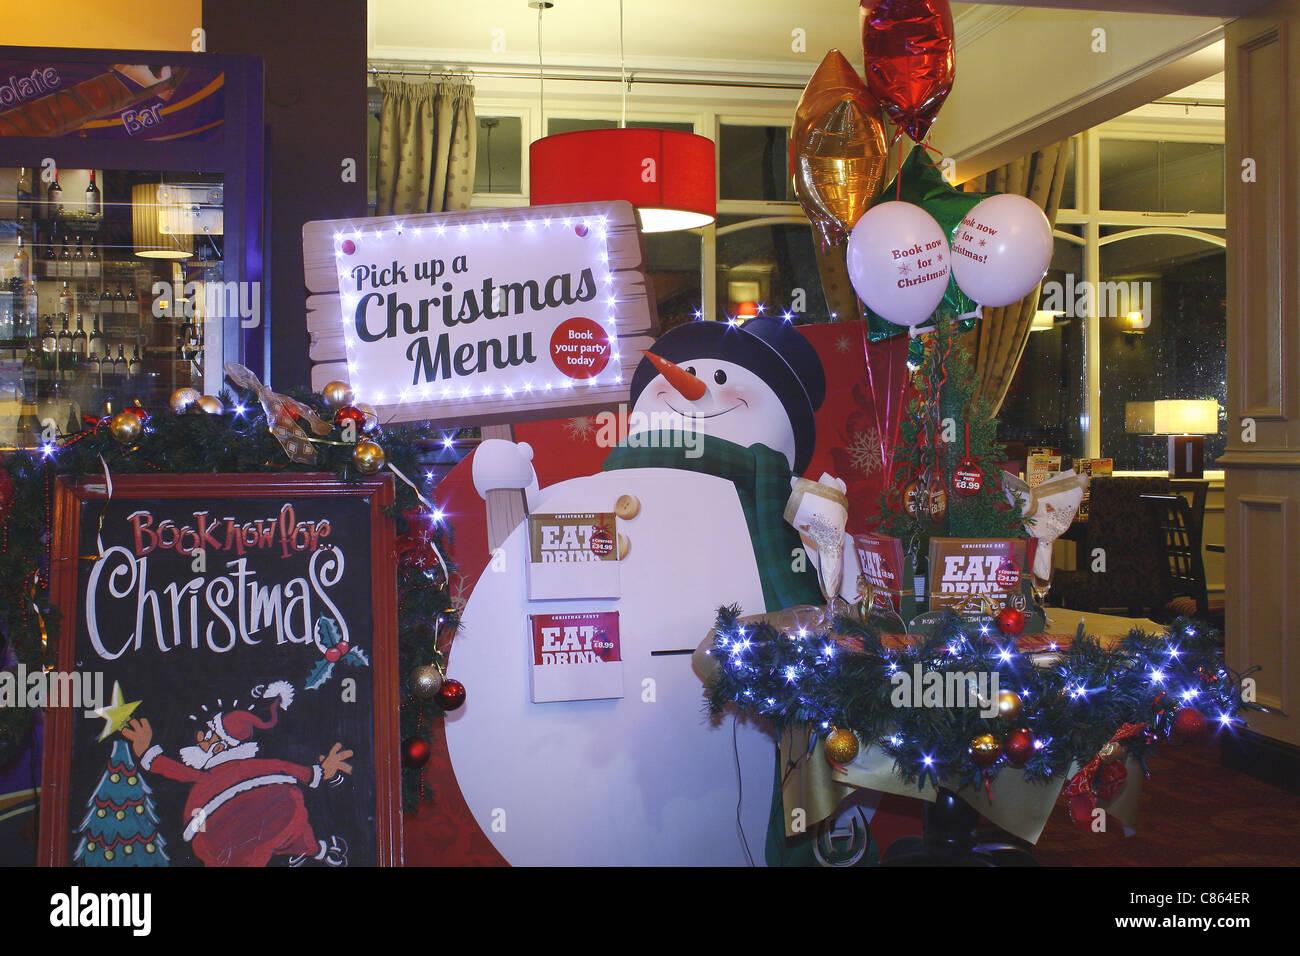 christmas display for menus in local pub - Stock Image